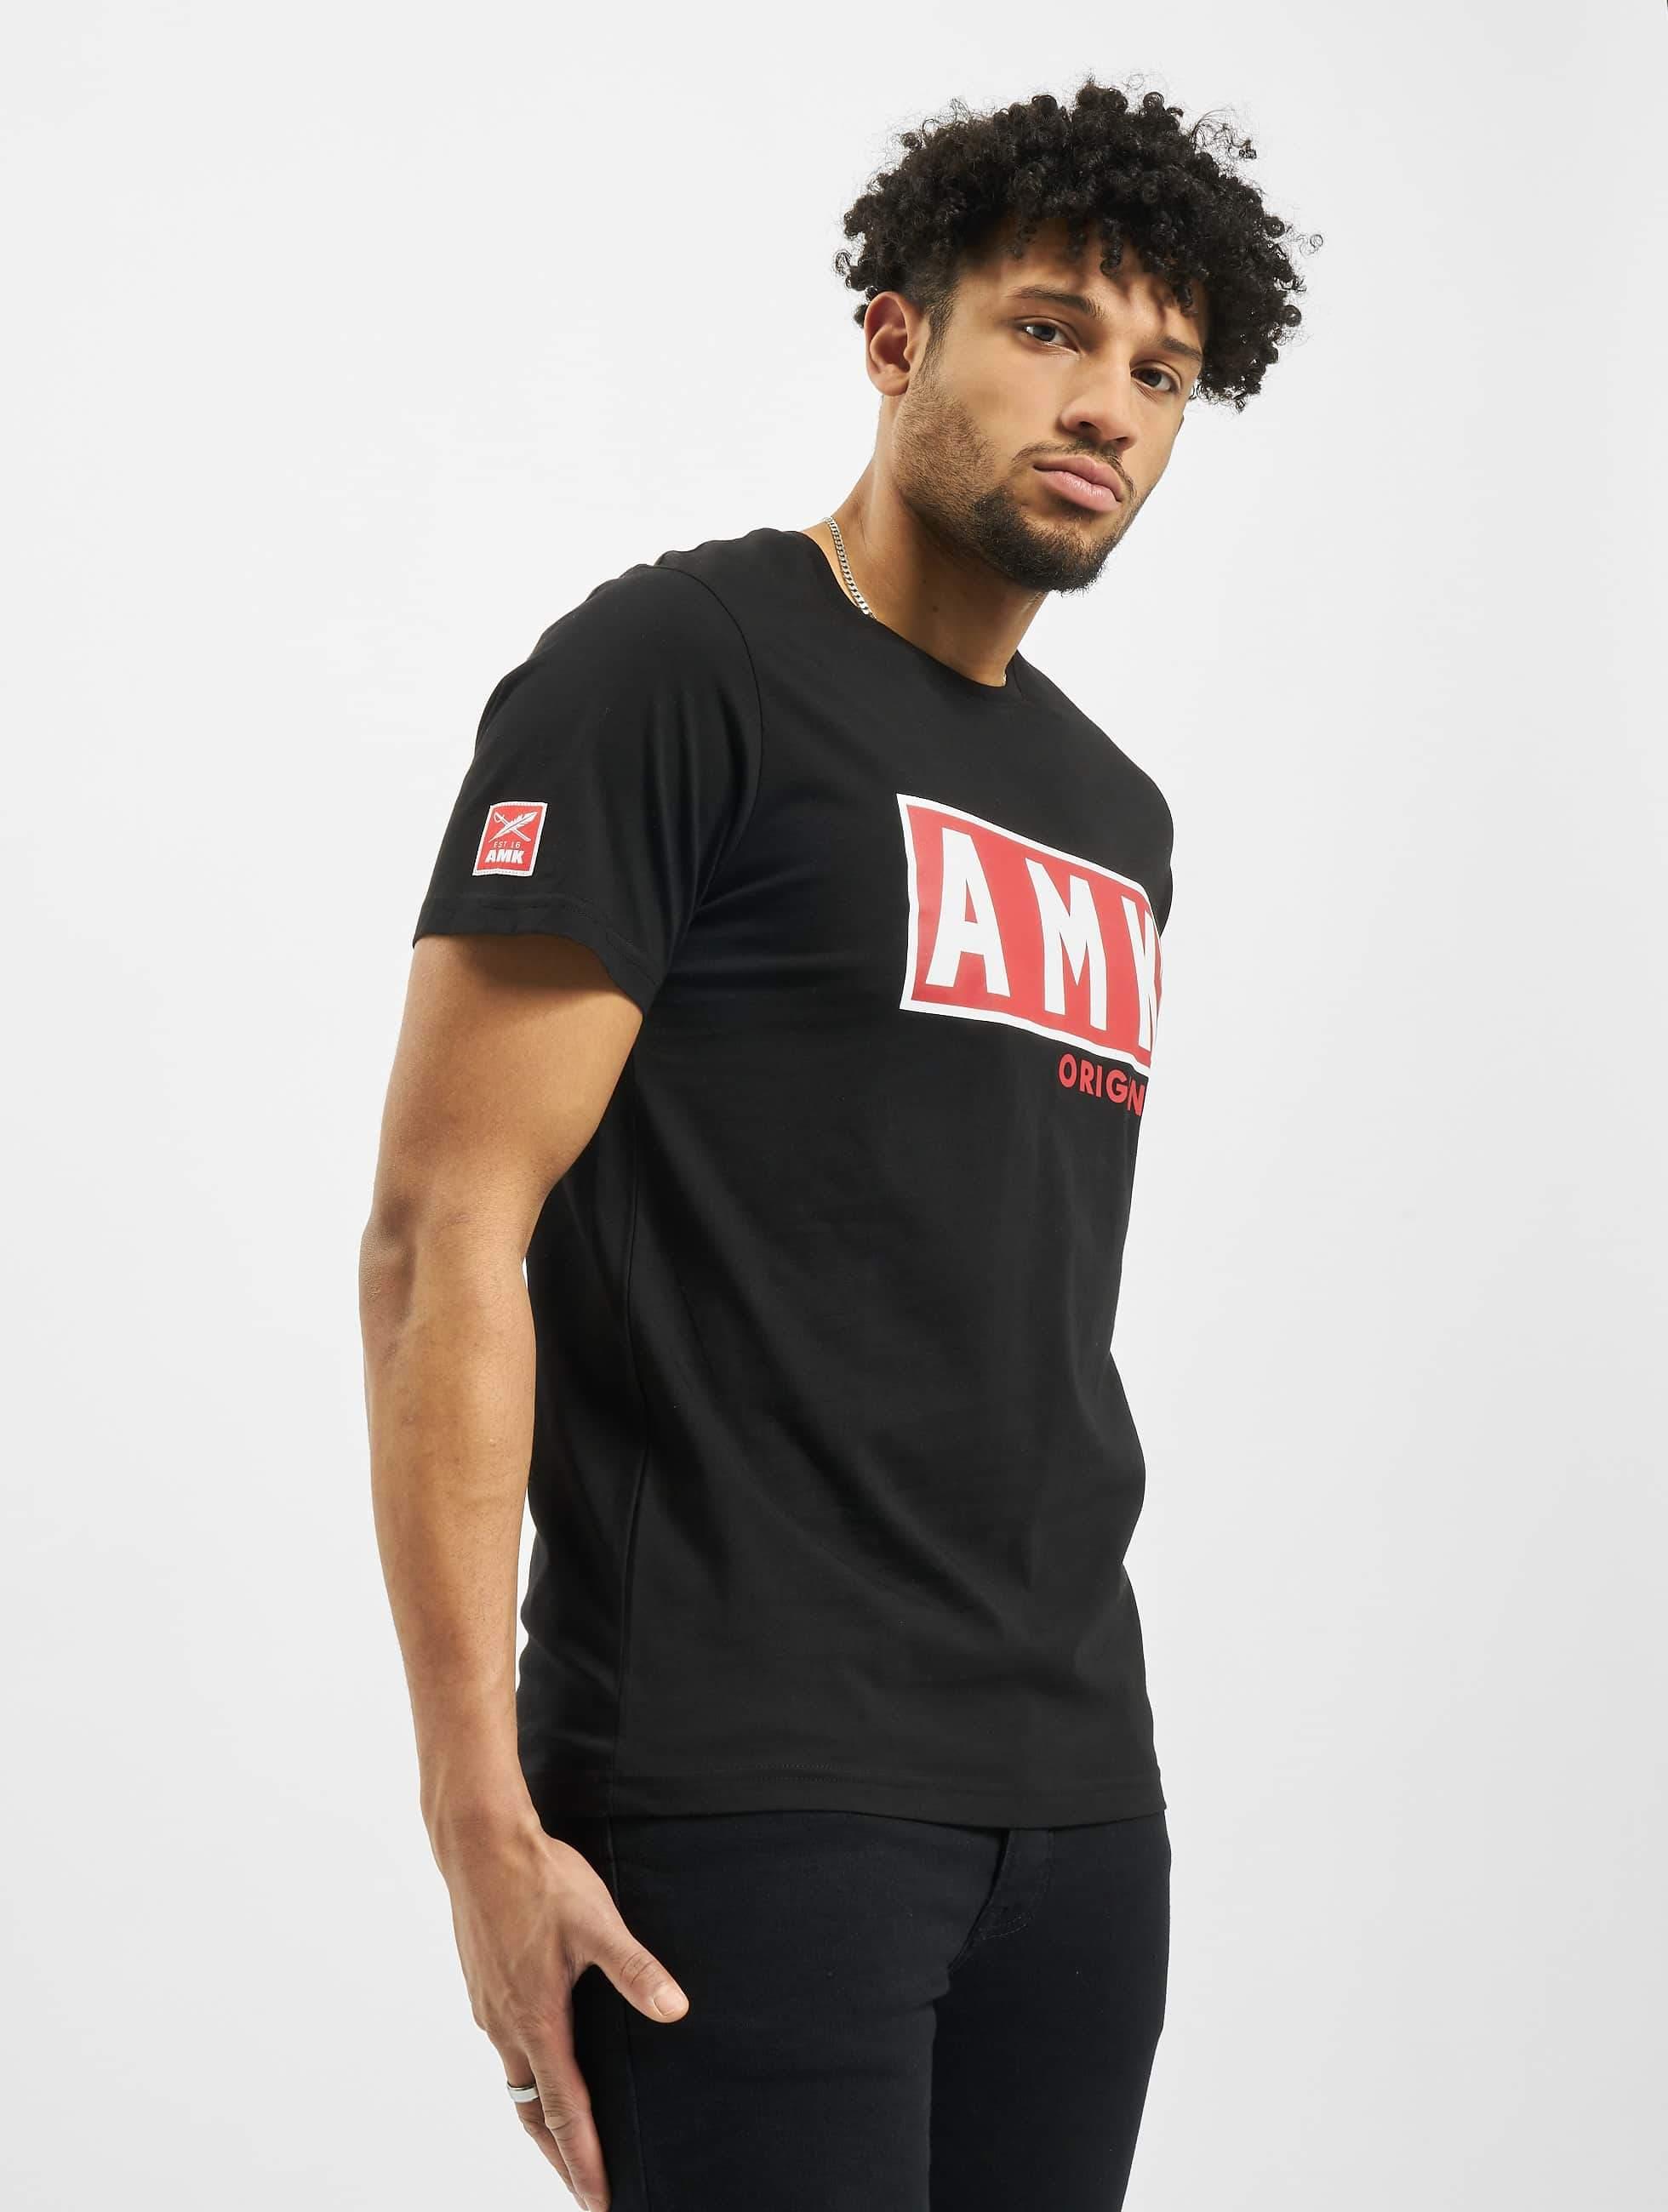 AMK | Originals noir Homme T-Shirt